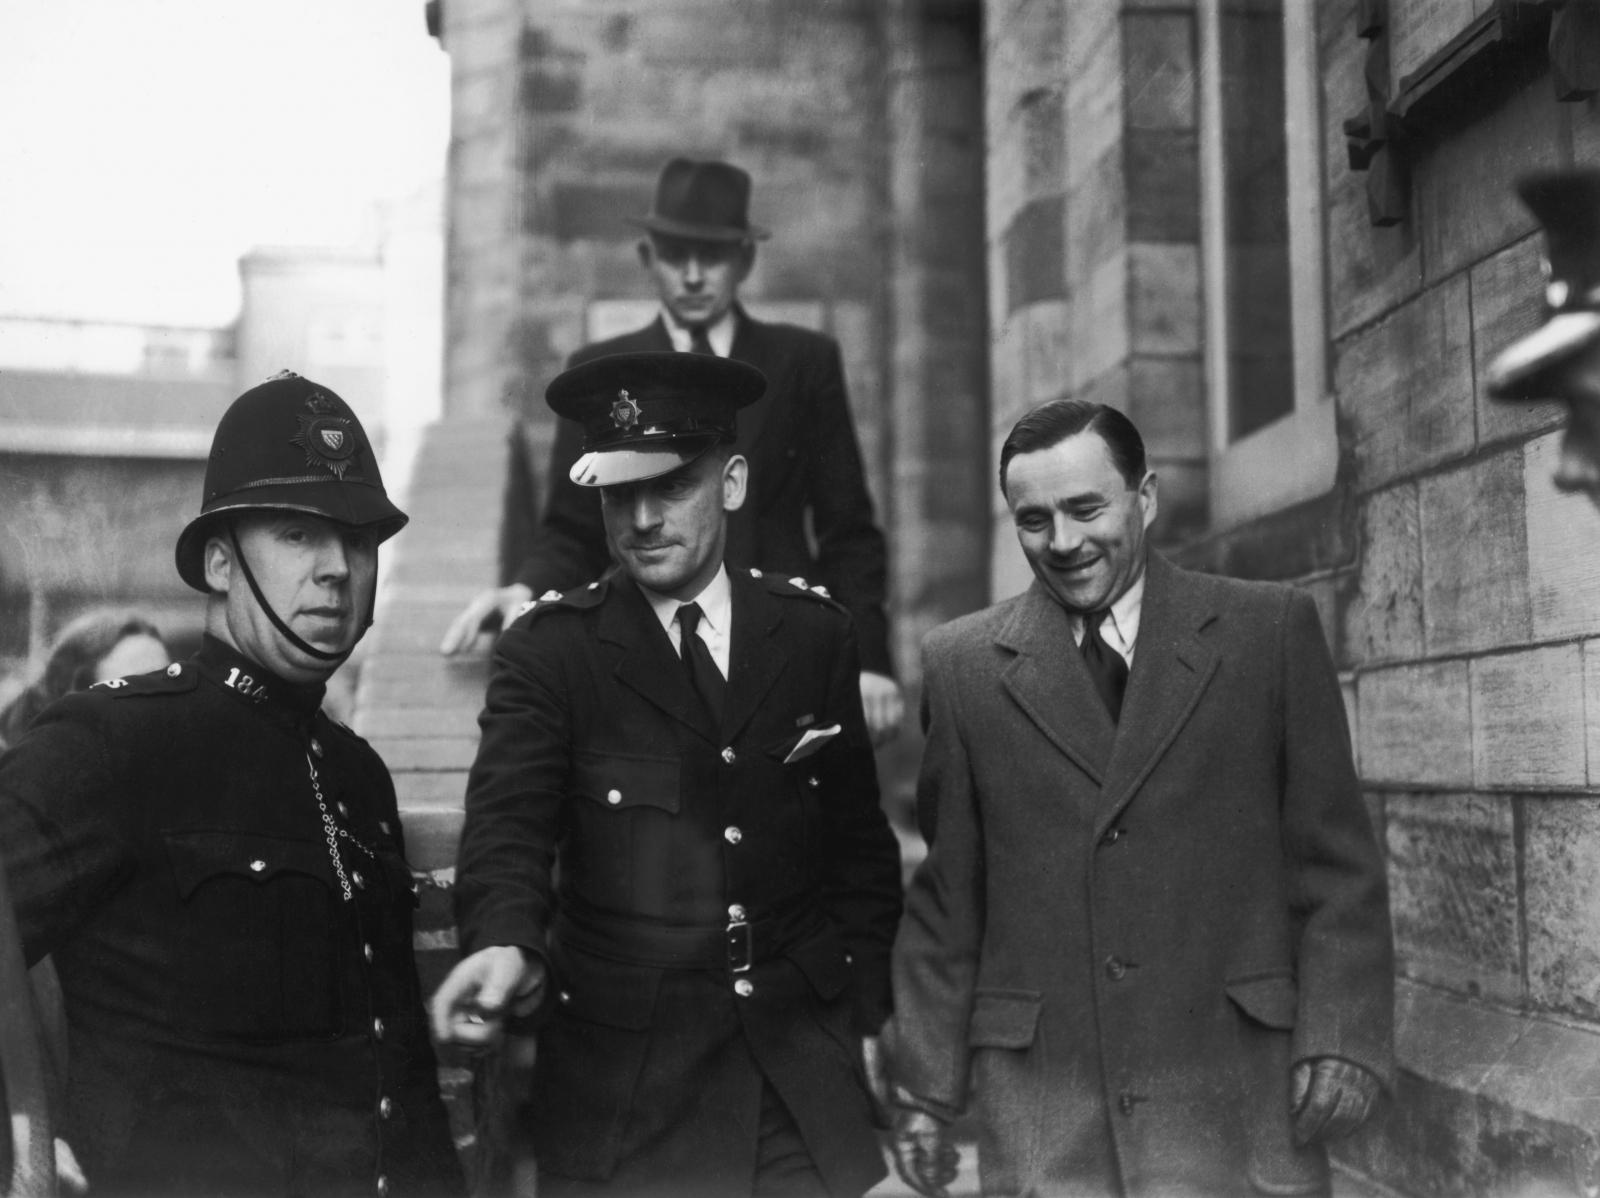 John George Haigh acid bath murderer